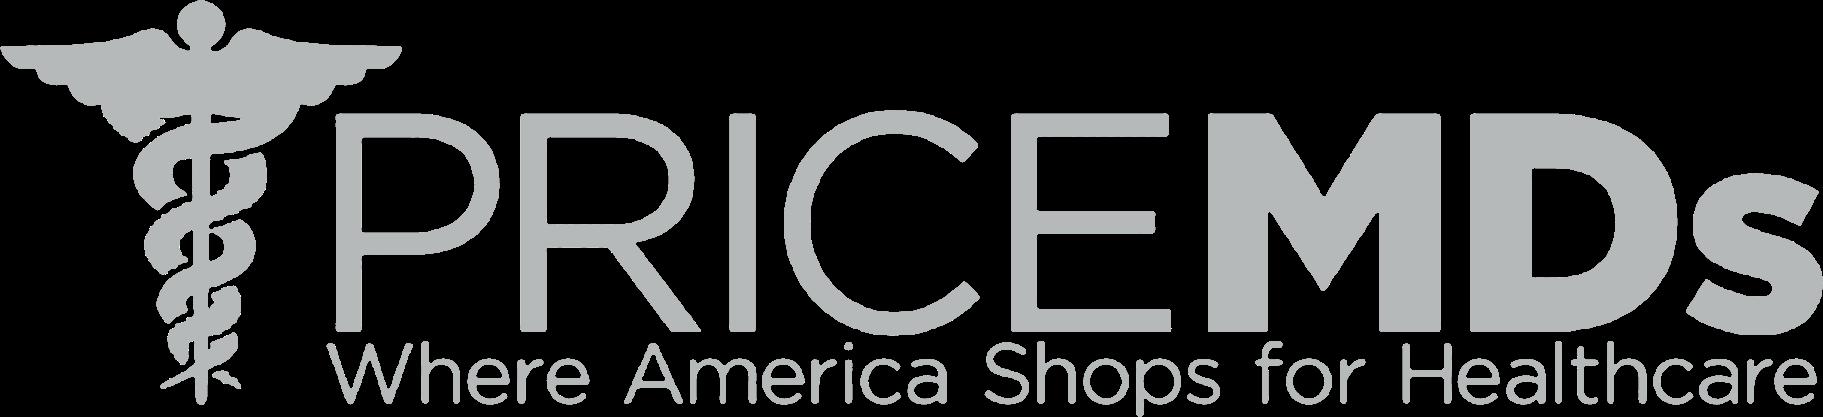 Price MDs Logo